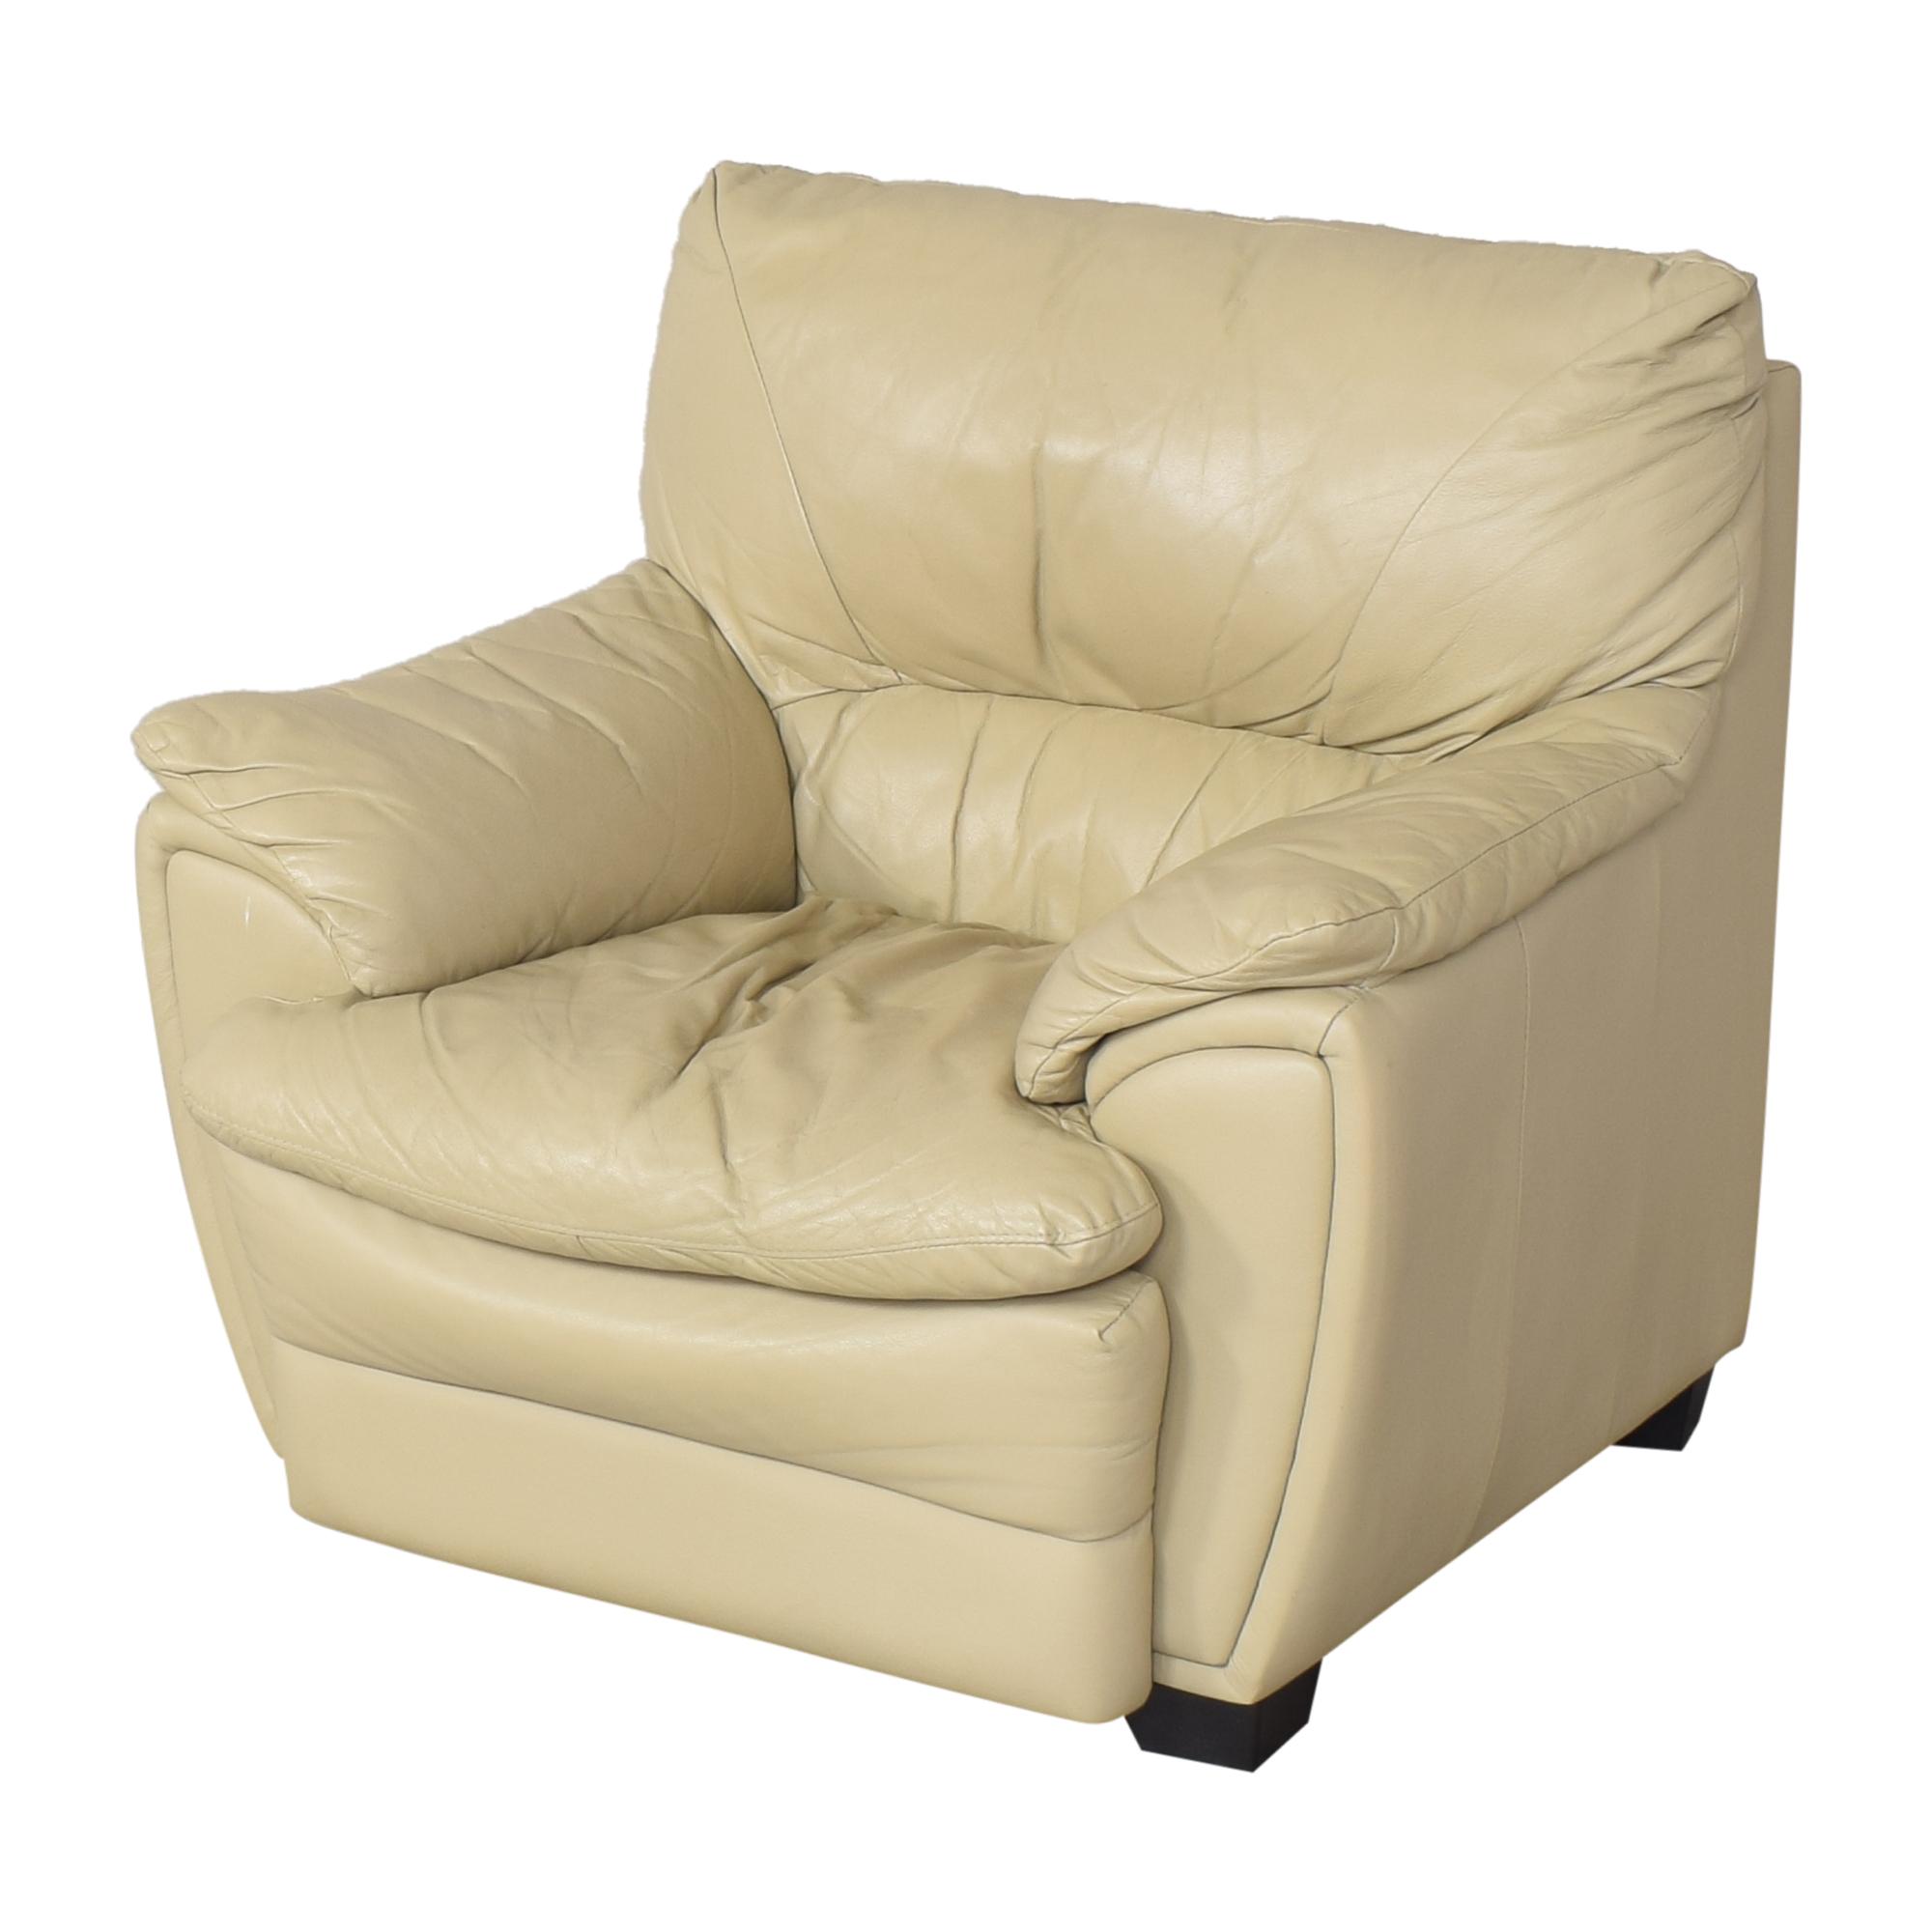 buy Raymour & Flanigan Padded Arm Chair Raymour & Flanigan Chairs